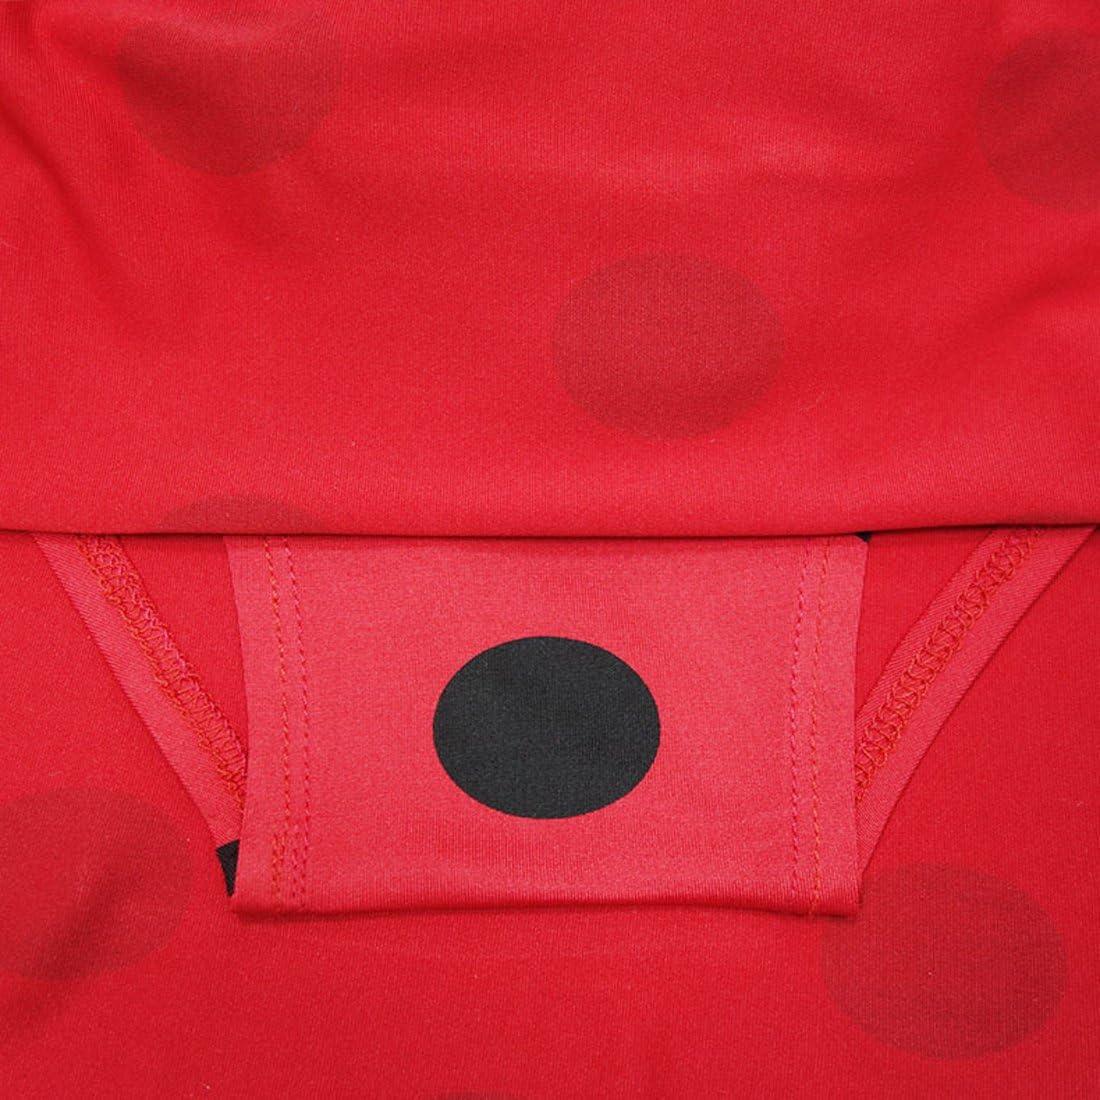 ZHBNN Ladybug Girls Cartoon Two-Piece Swimwear Bathing Suit